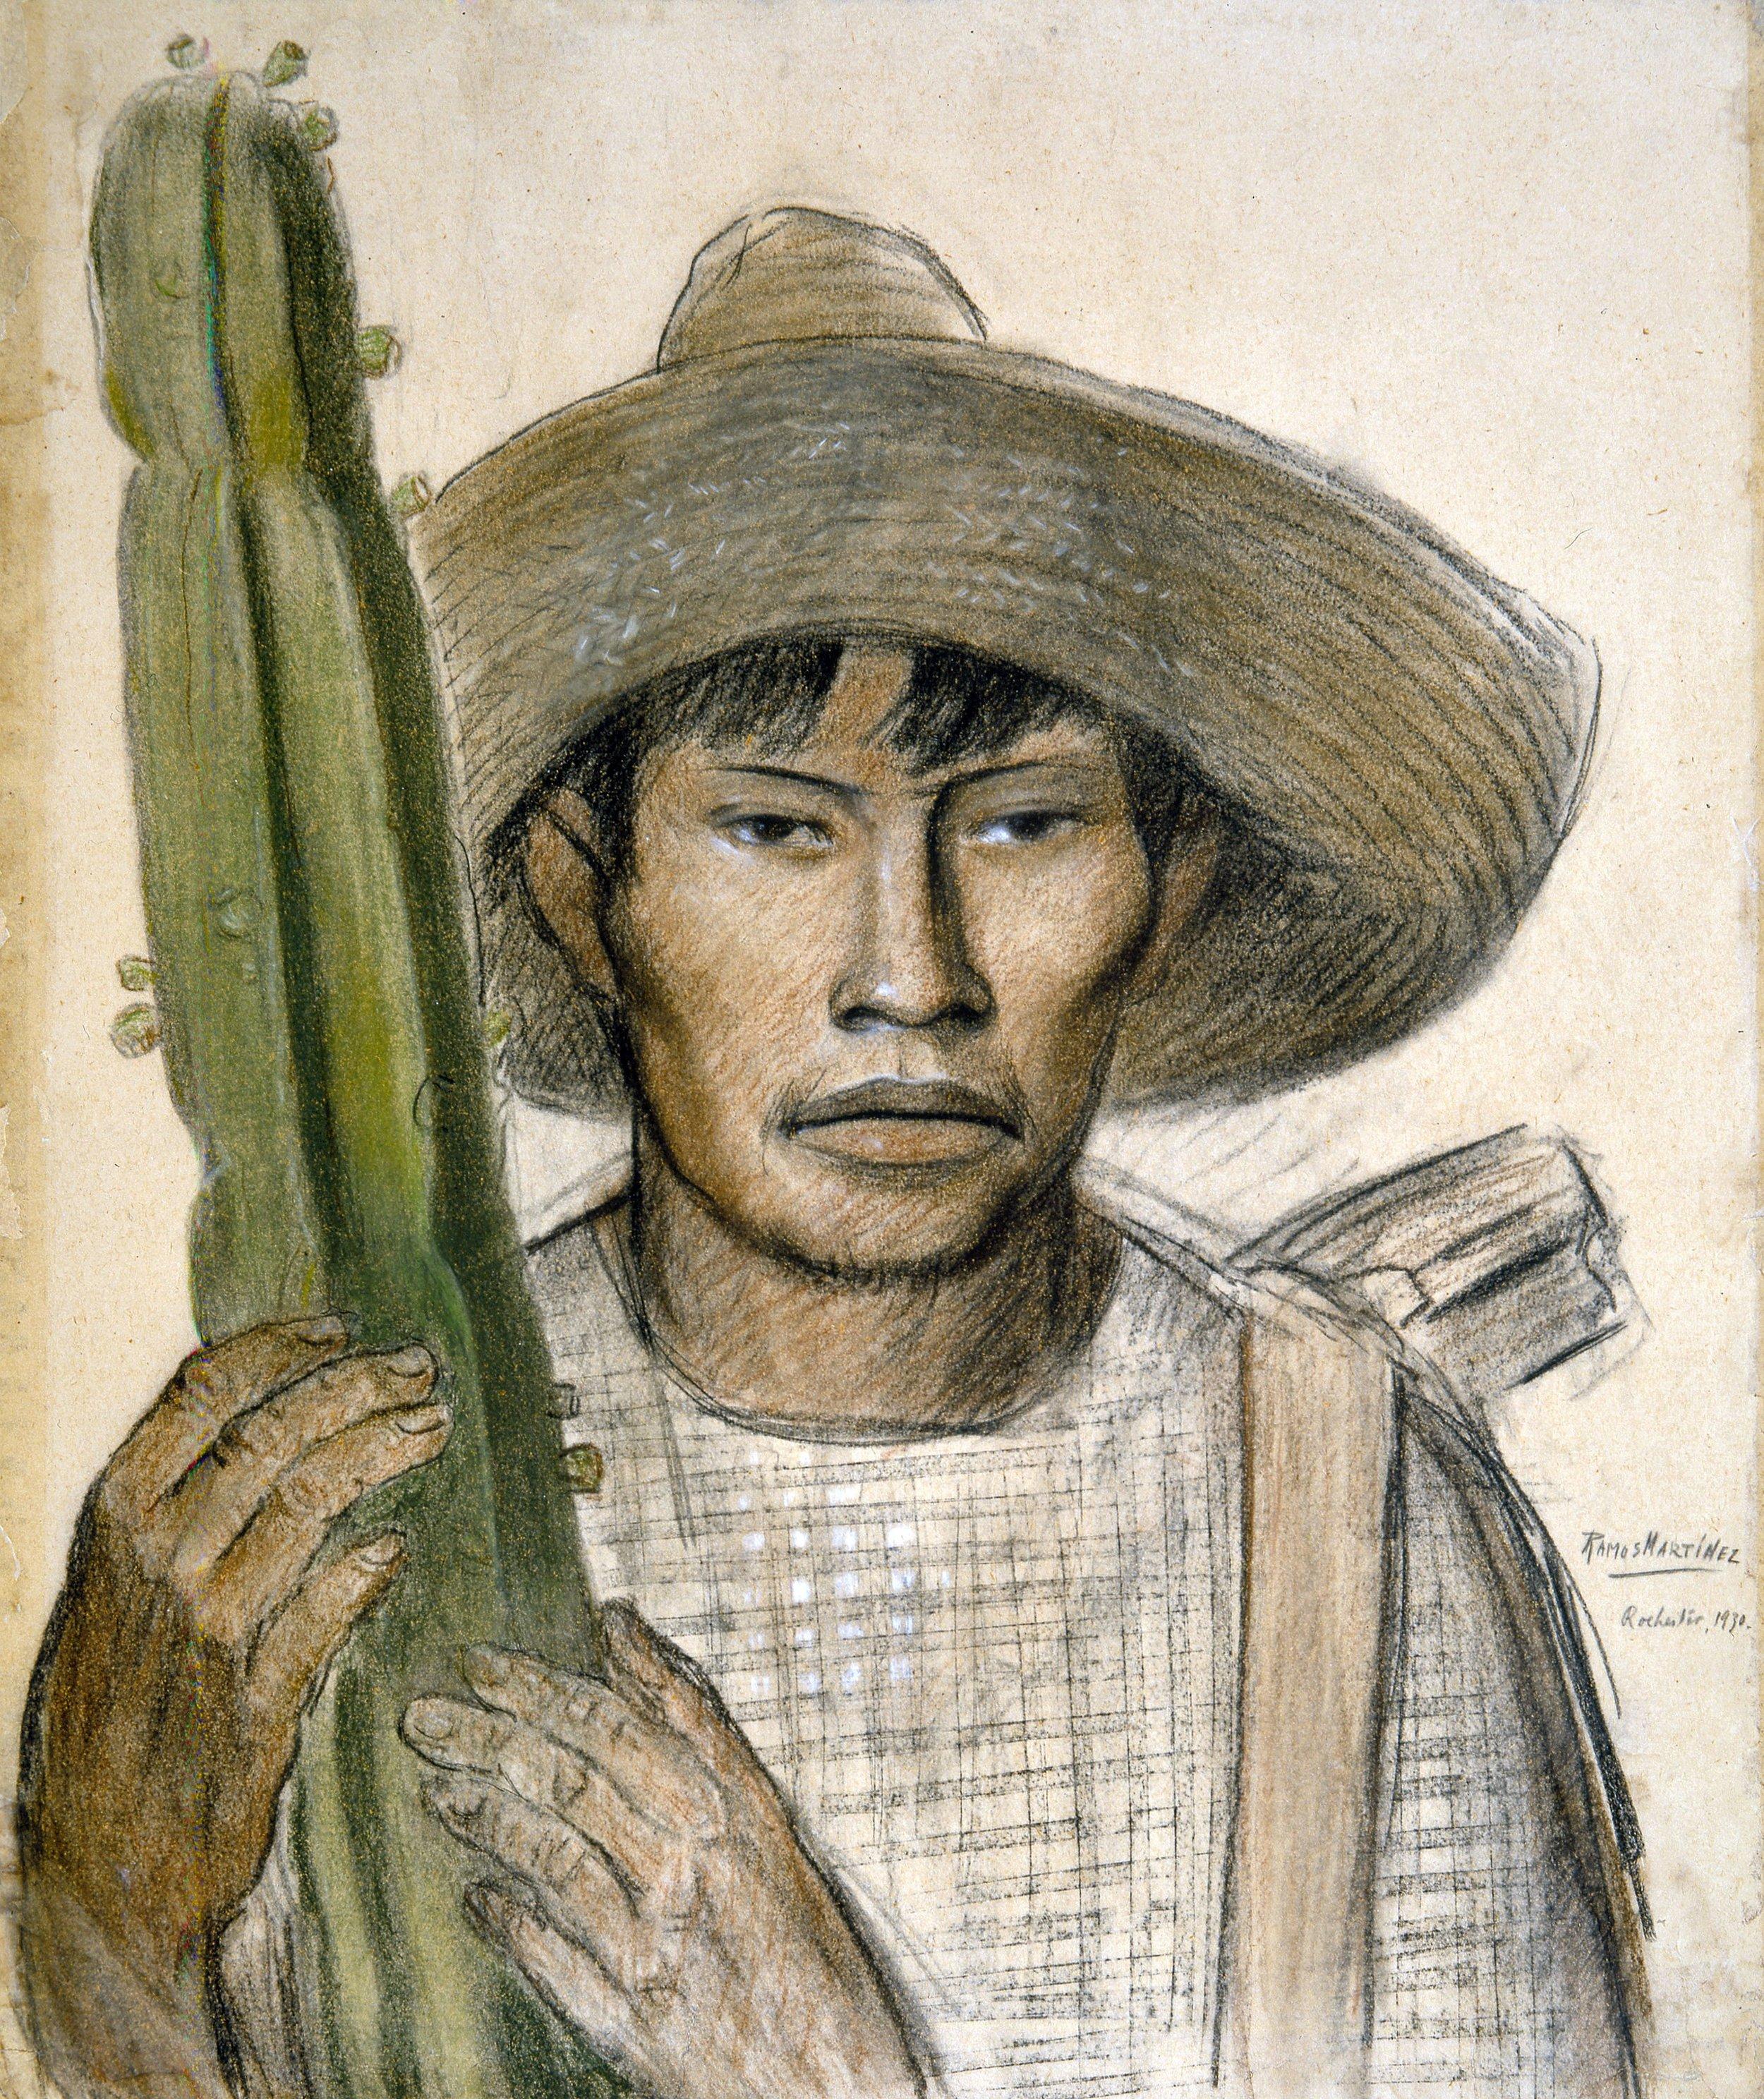 Joven Mexicano con Nopal / Mexican Boy with Cactus  1930 pastel and Conté crayon on paper / pintura al pastel y crayon Conté sobre papel 19 x 23.3 inches;48.3 x 59.1 centímetros Private collection